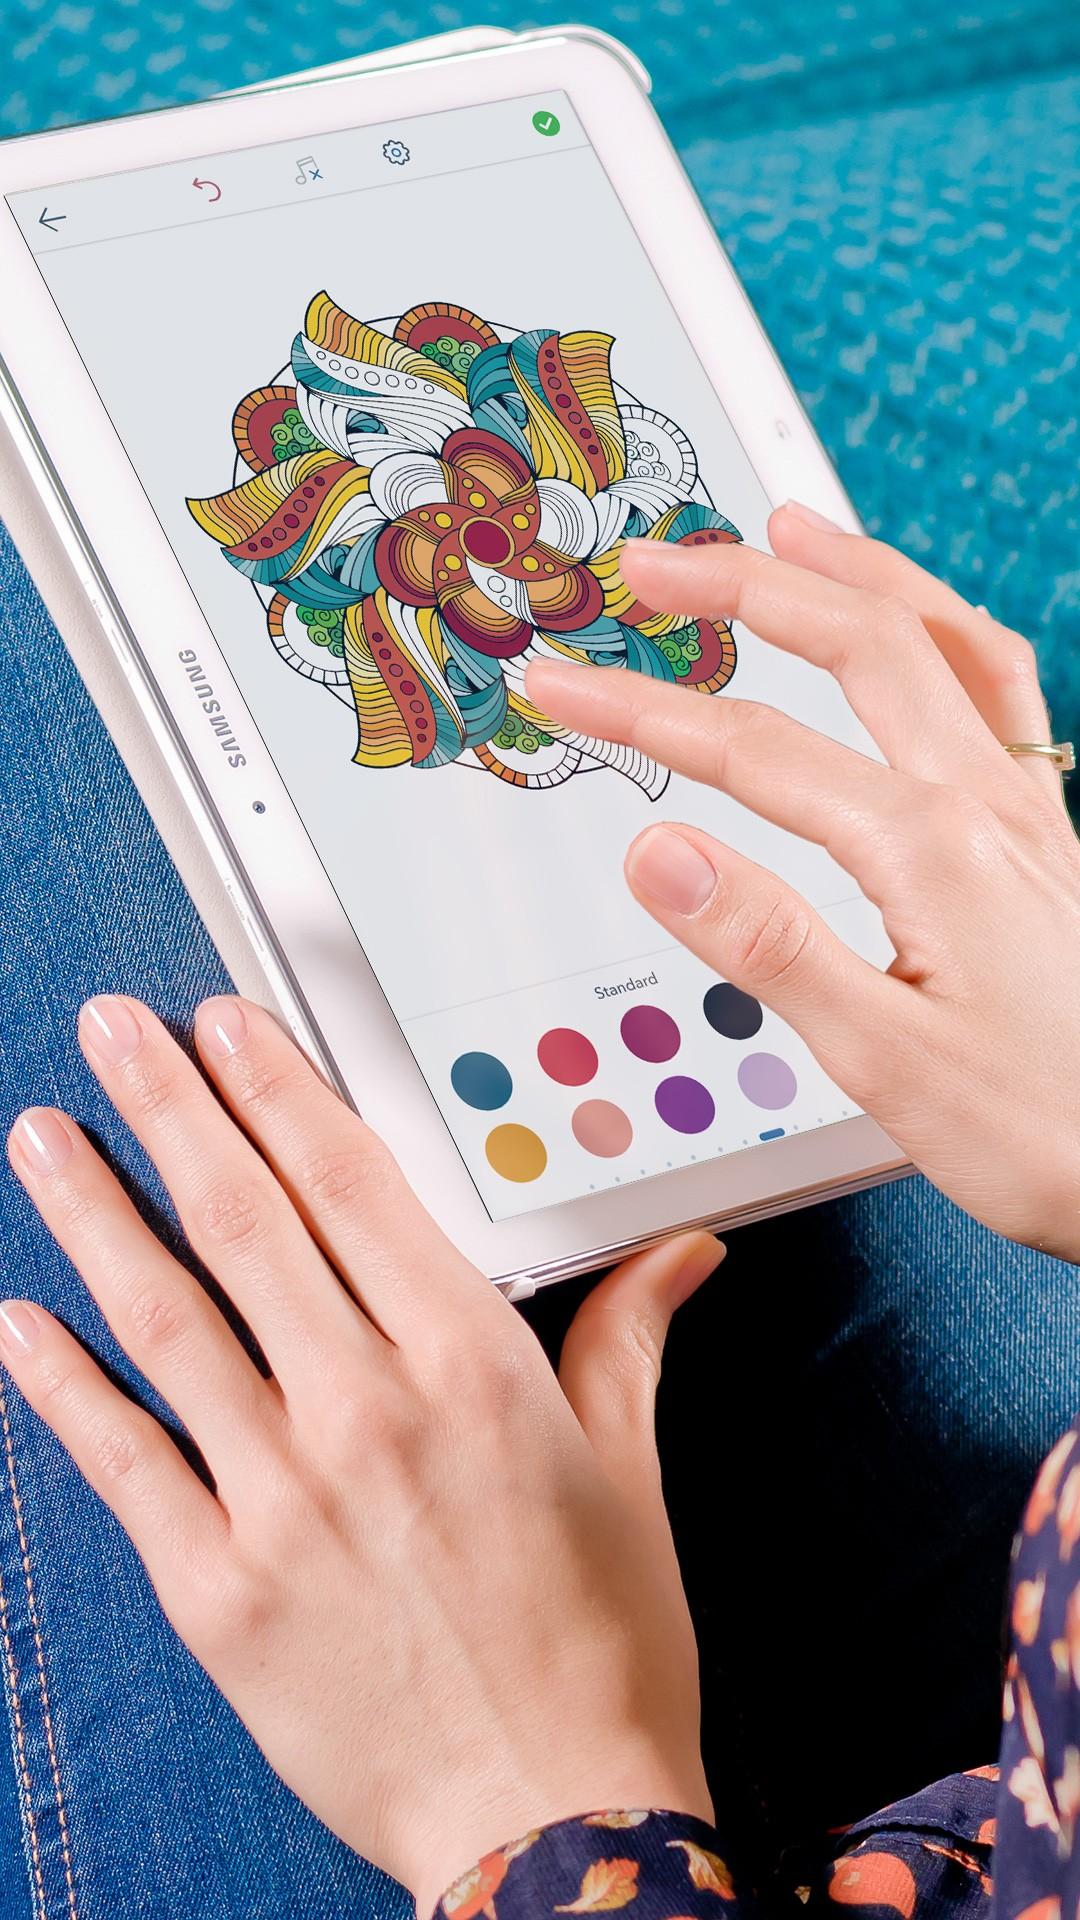 Magic Mandalas: Coloring Pages